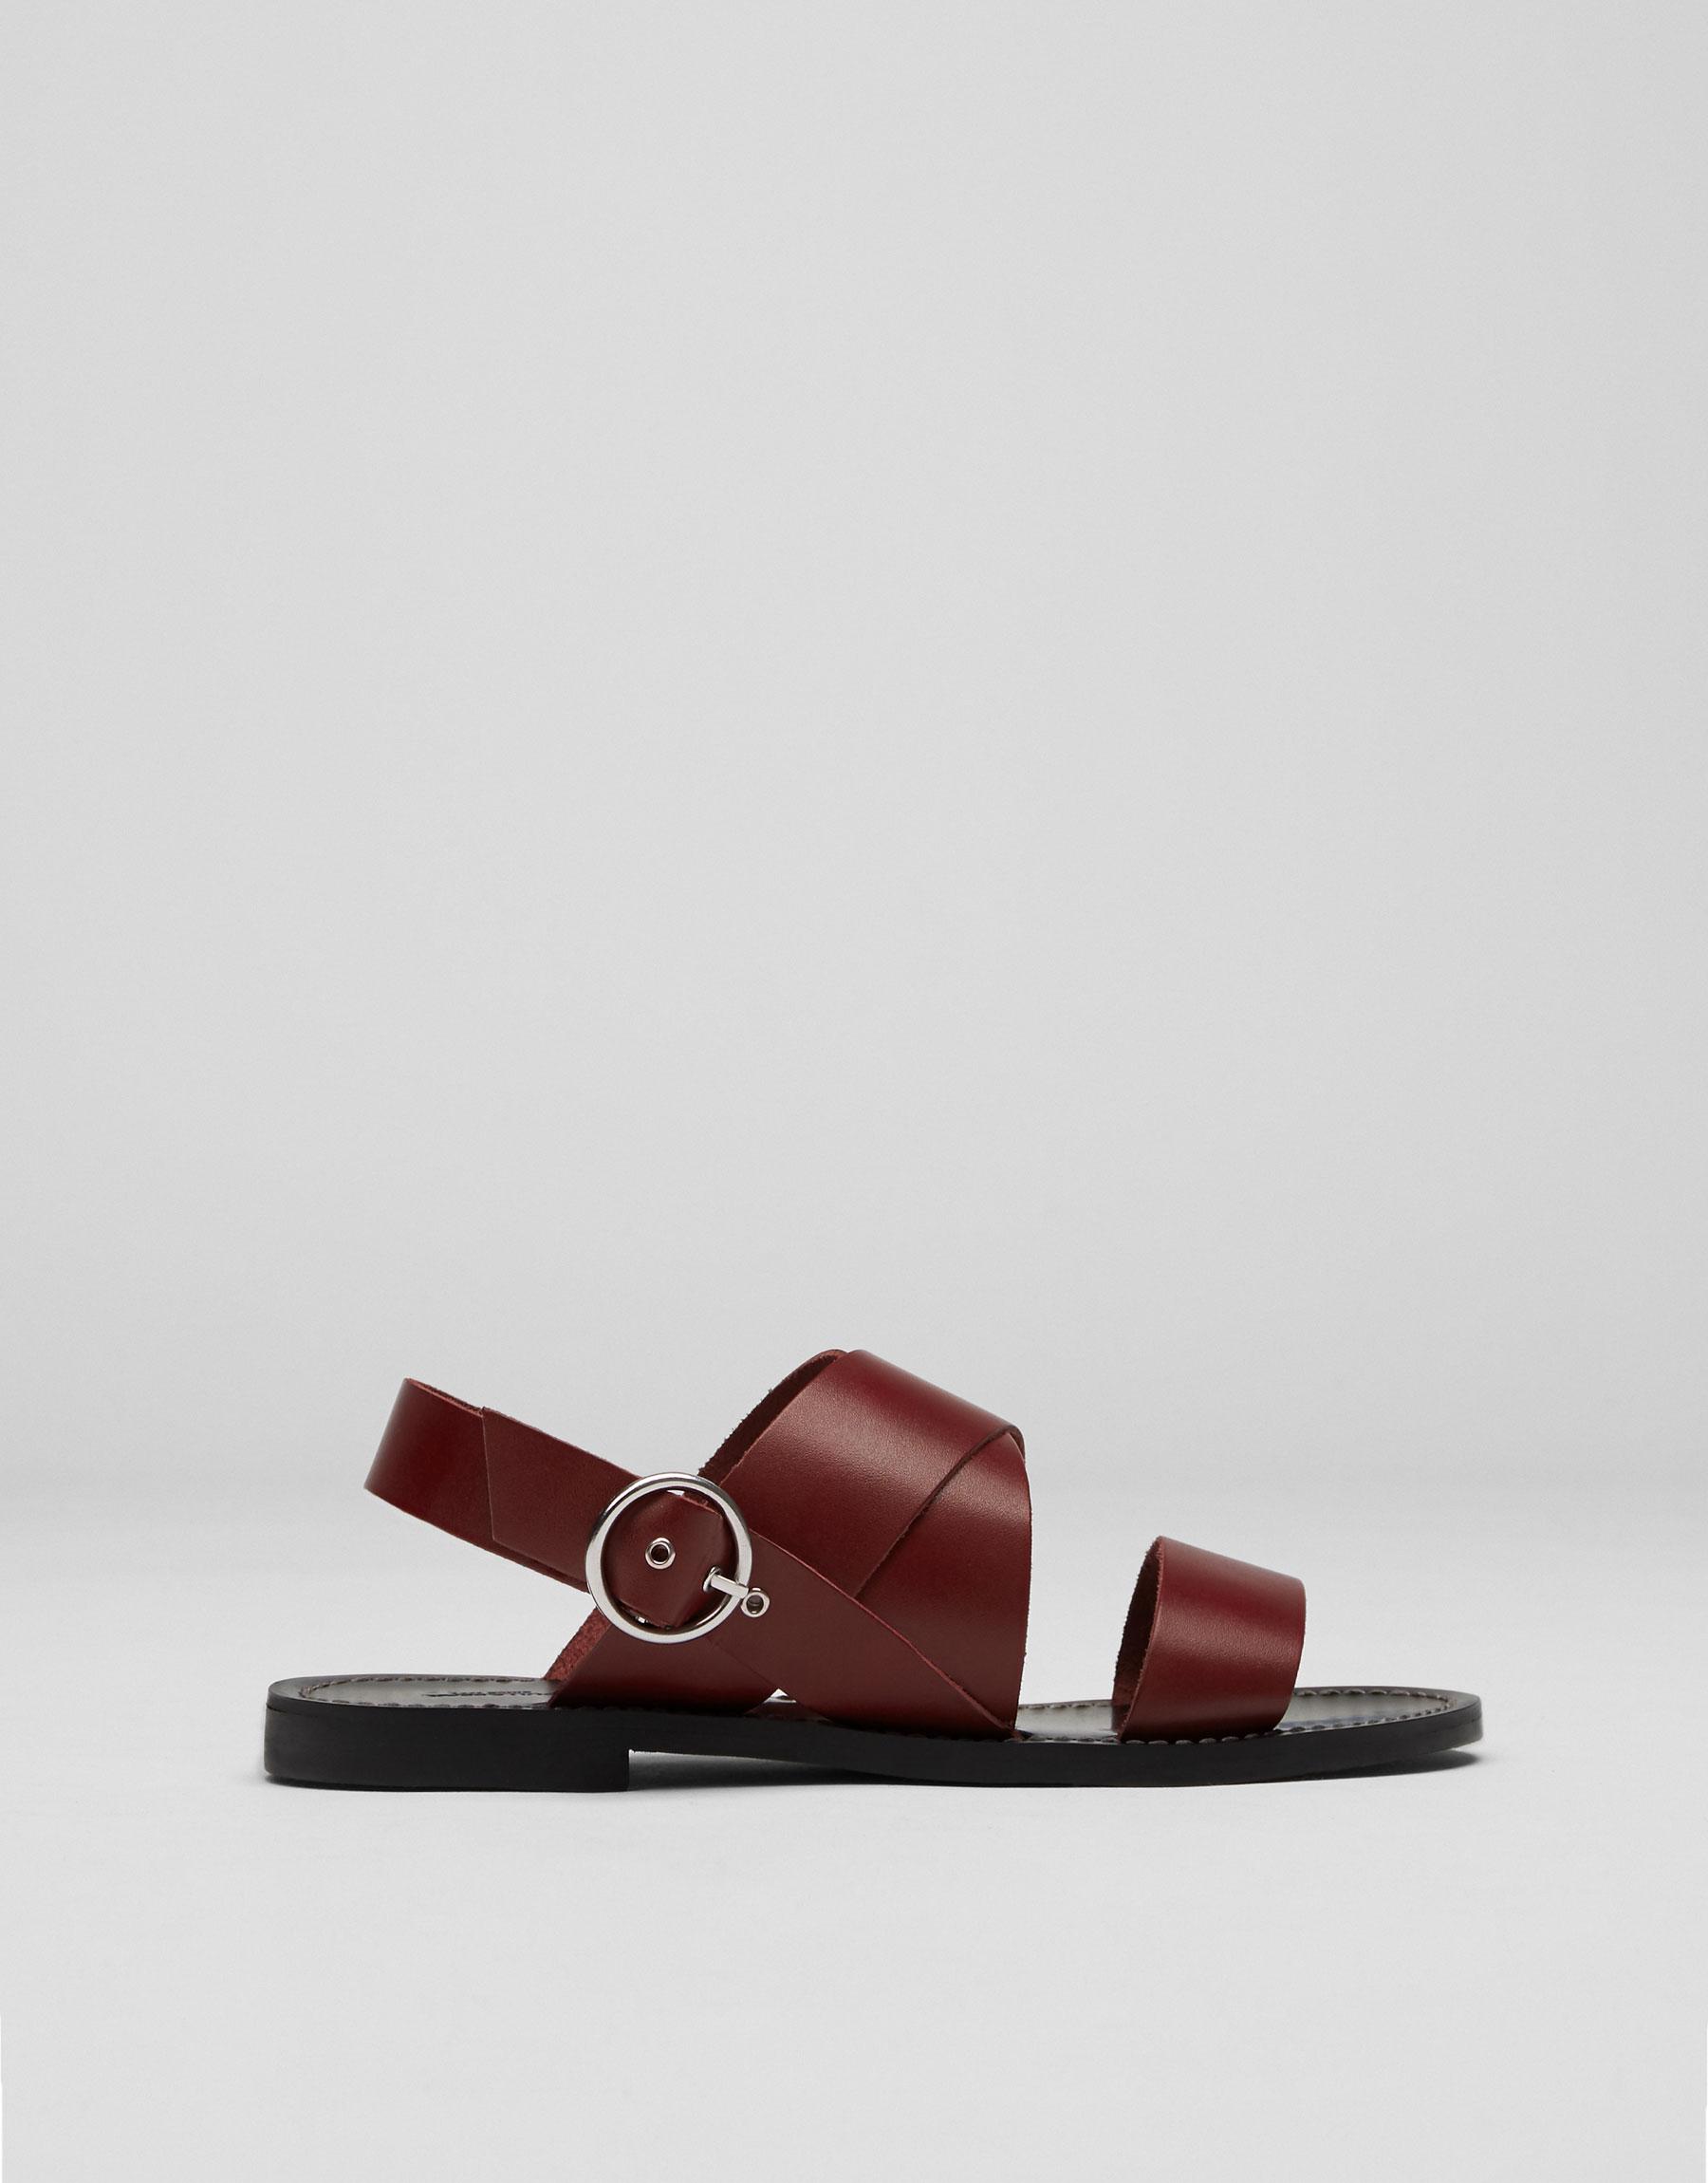 Donkerrode zachte leren sandaal